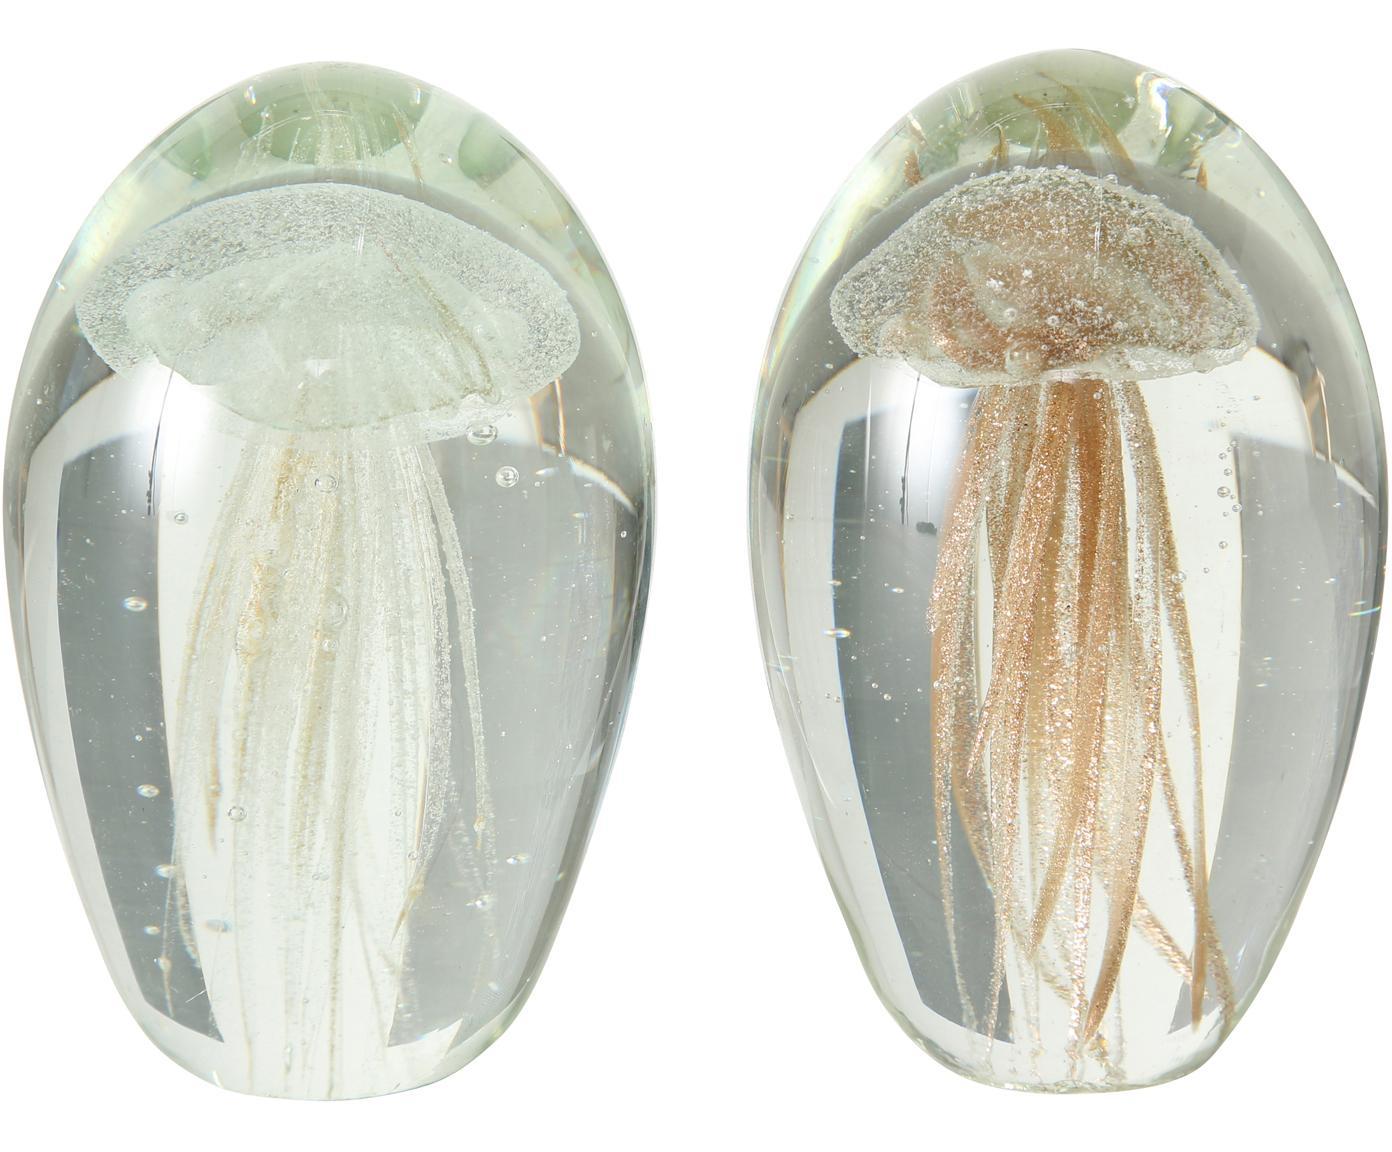 Deko-Objekte-Set Medusa, 2-tlg., Glas, Transparent, Ø 7 x H 10 cm